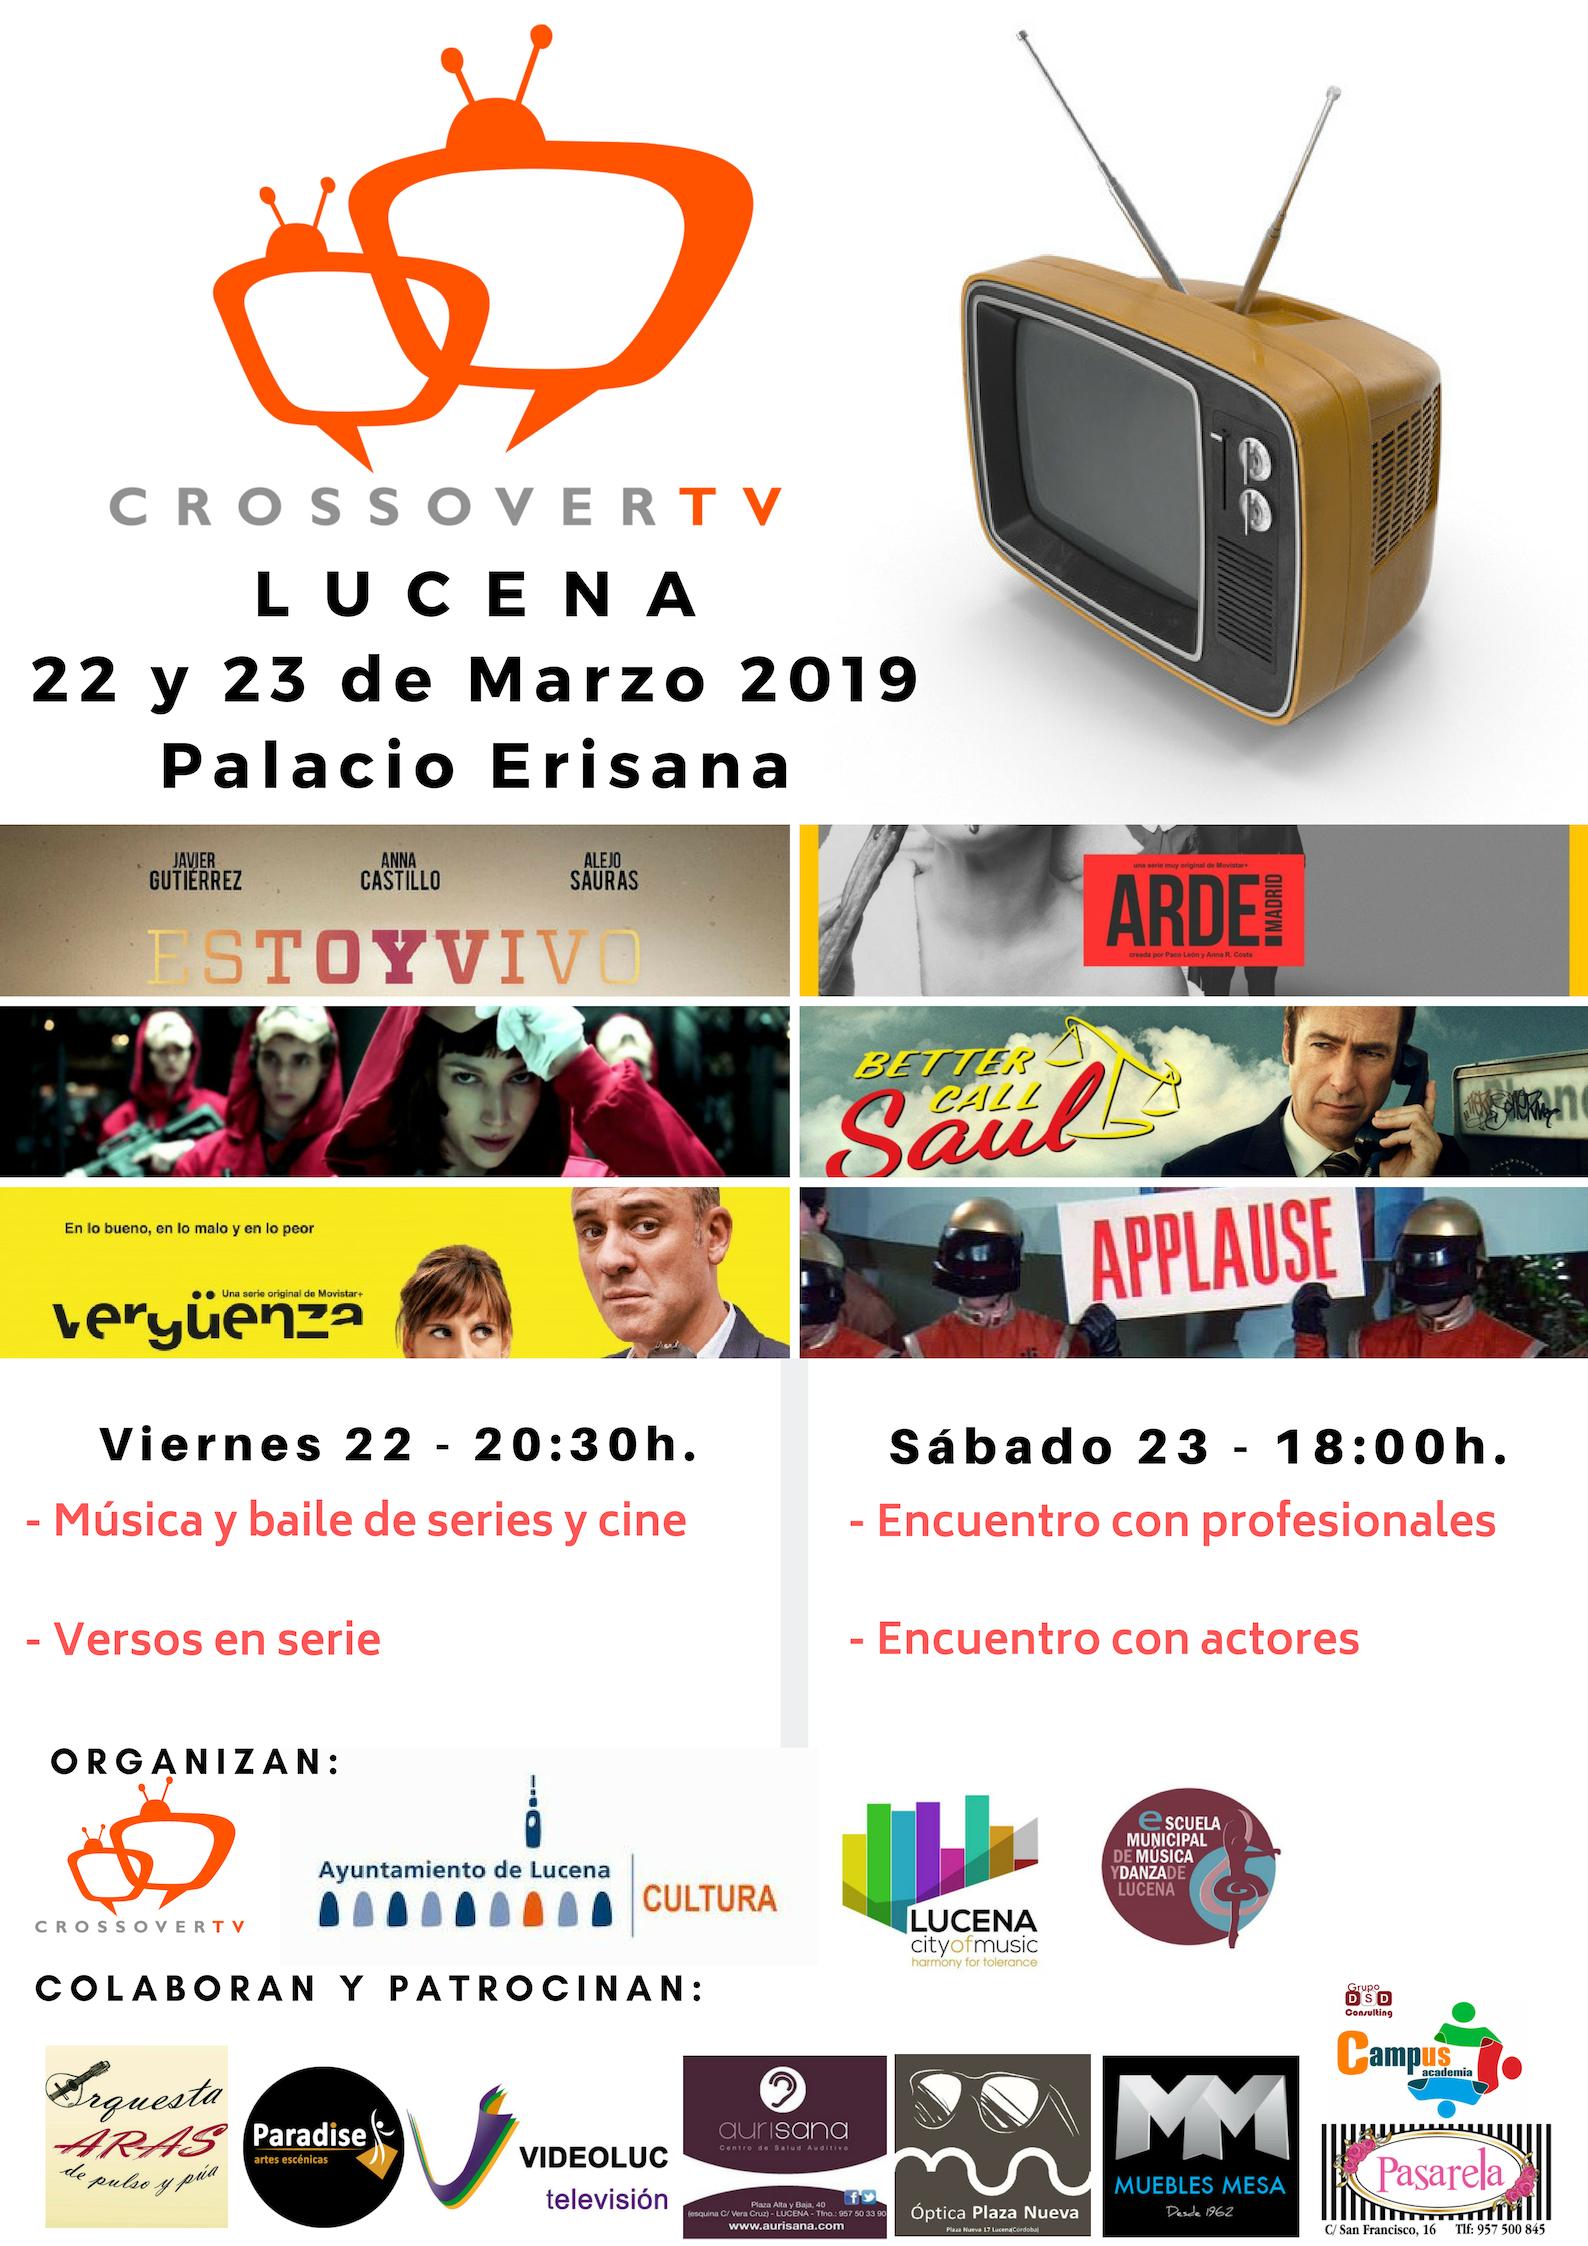 Crossover TV @ Palacio Erisana